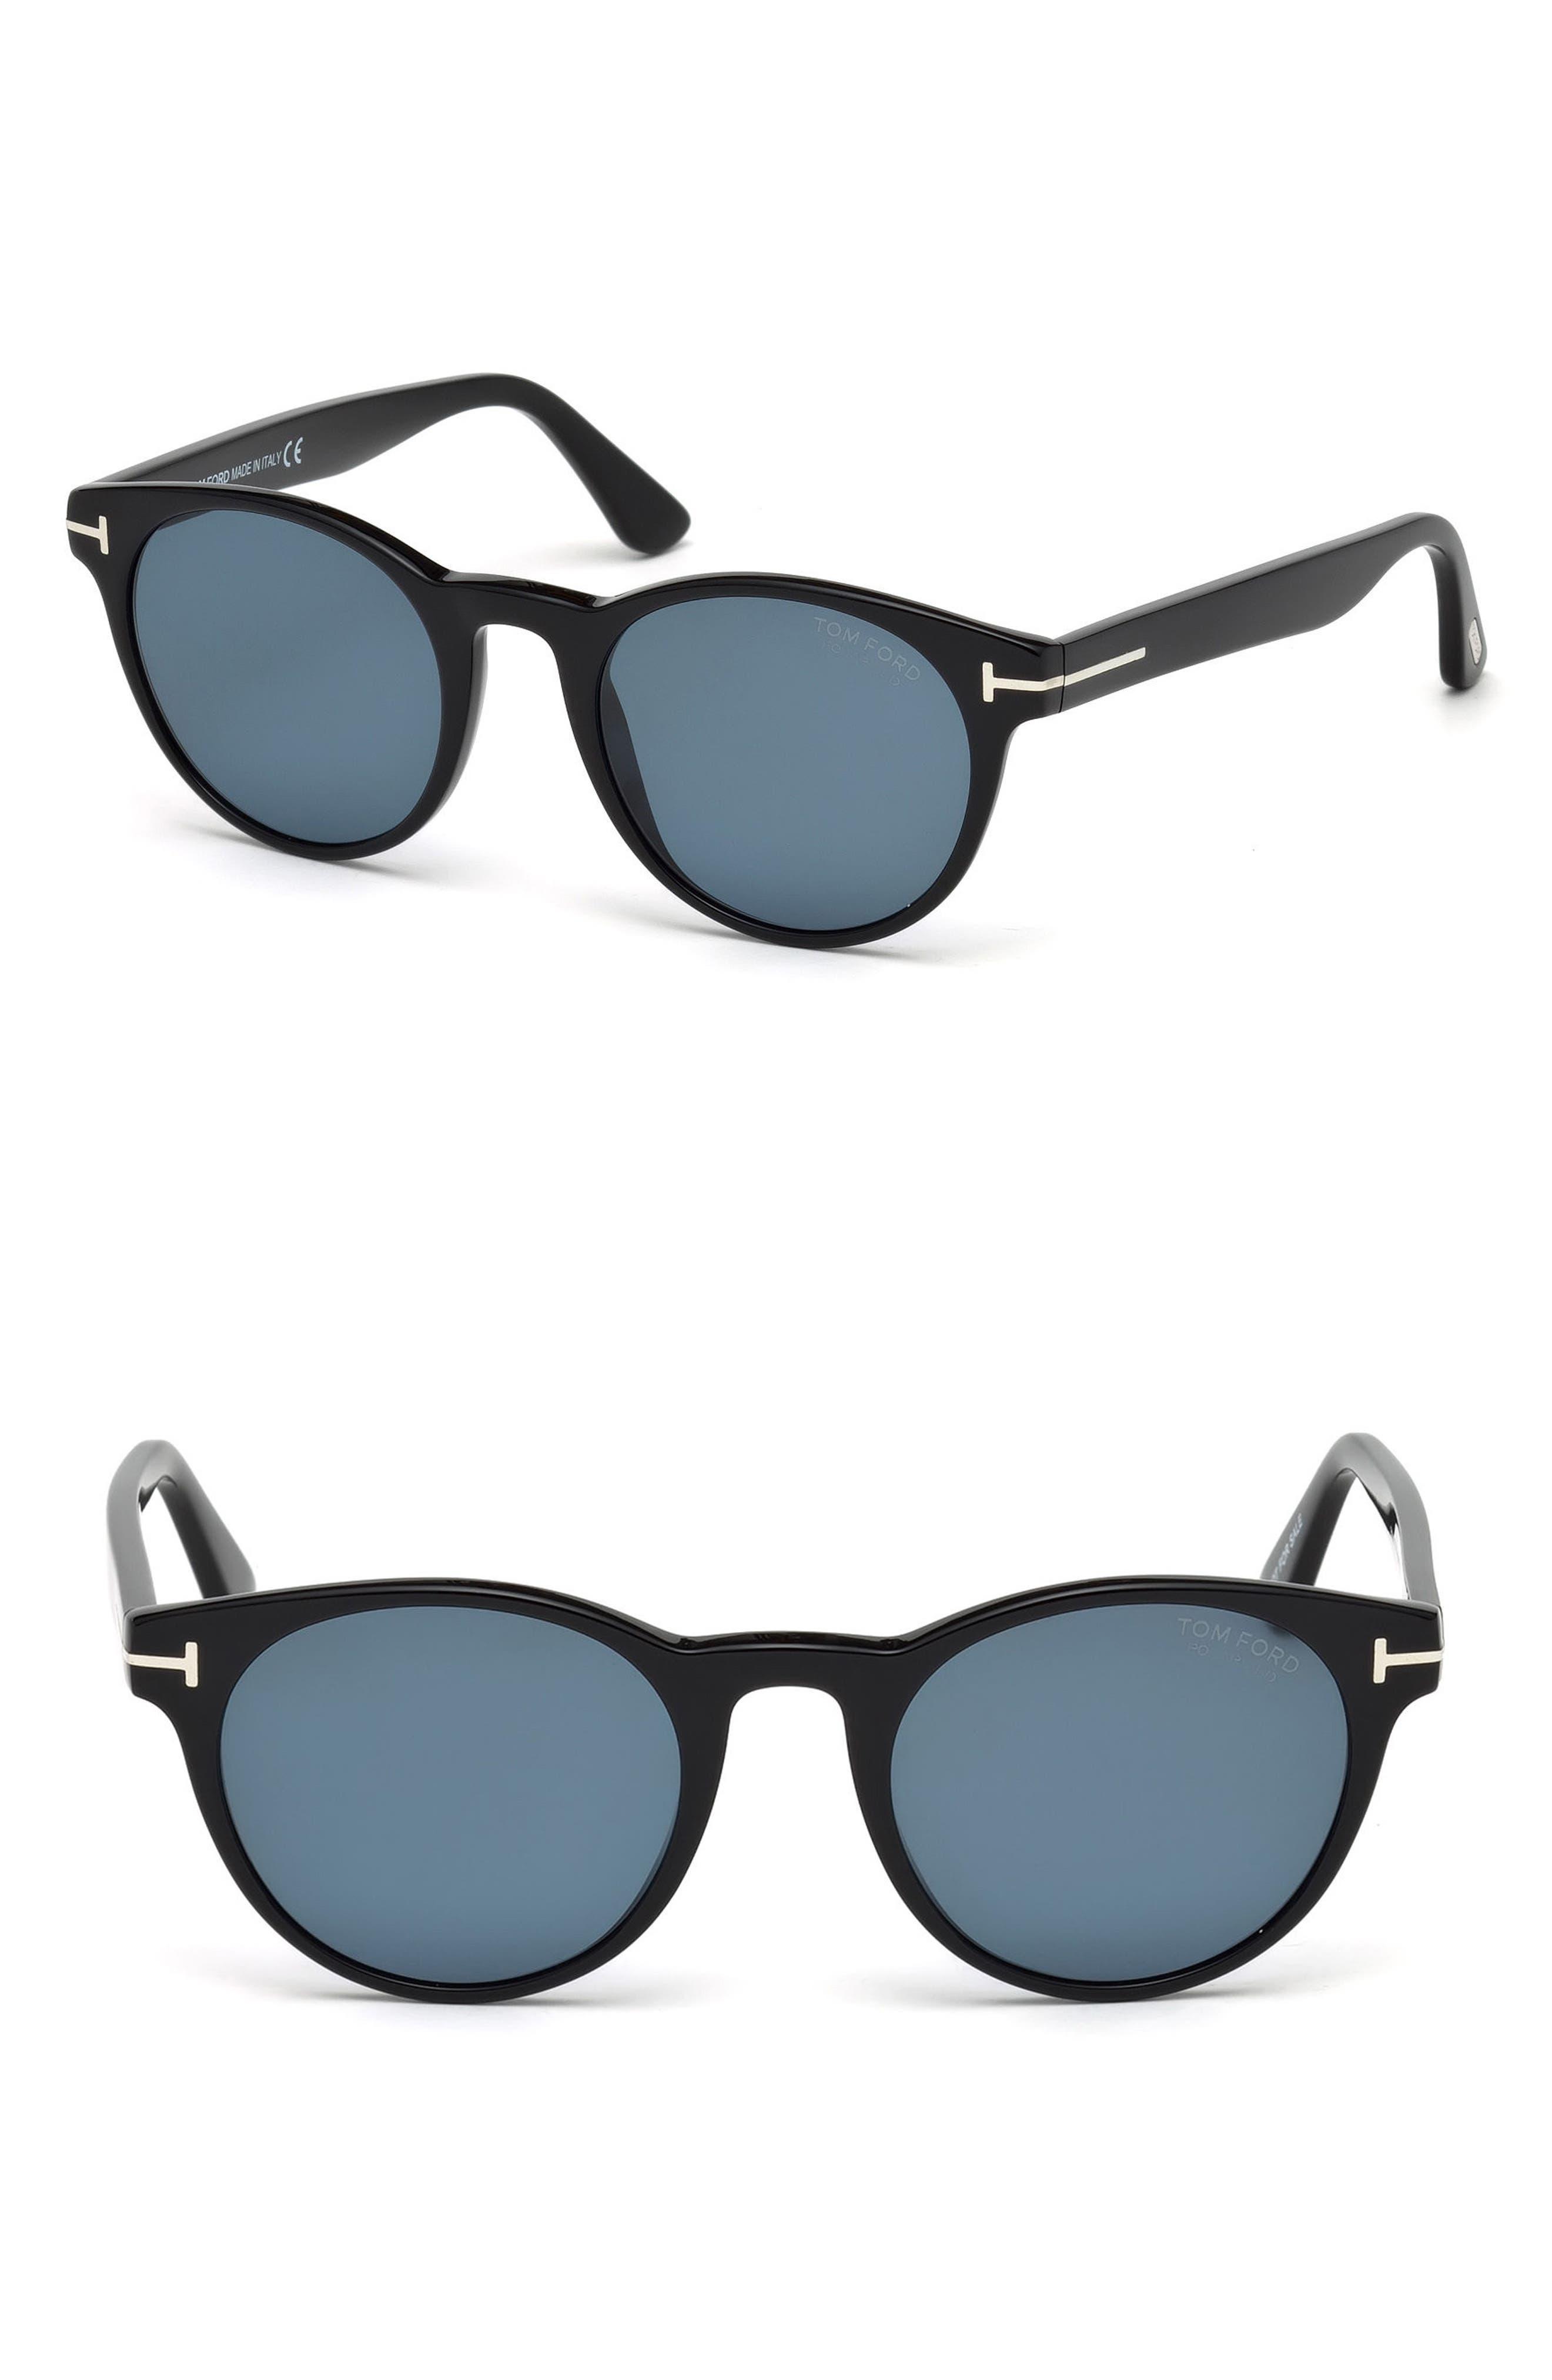 Tom Ford Palmer 51mm Polarized Sunglasses